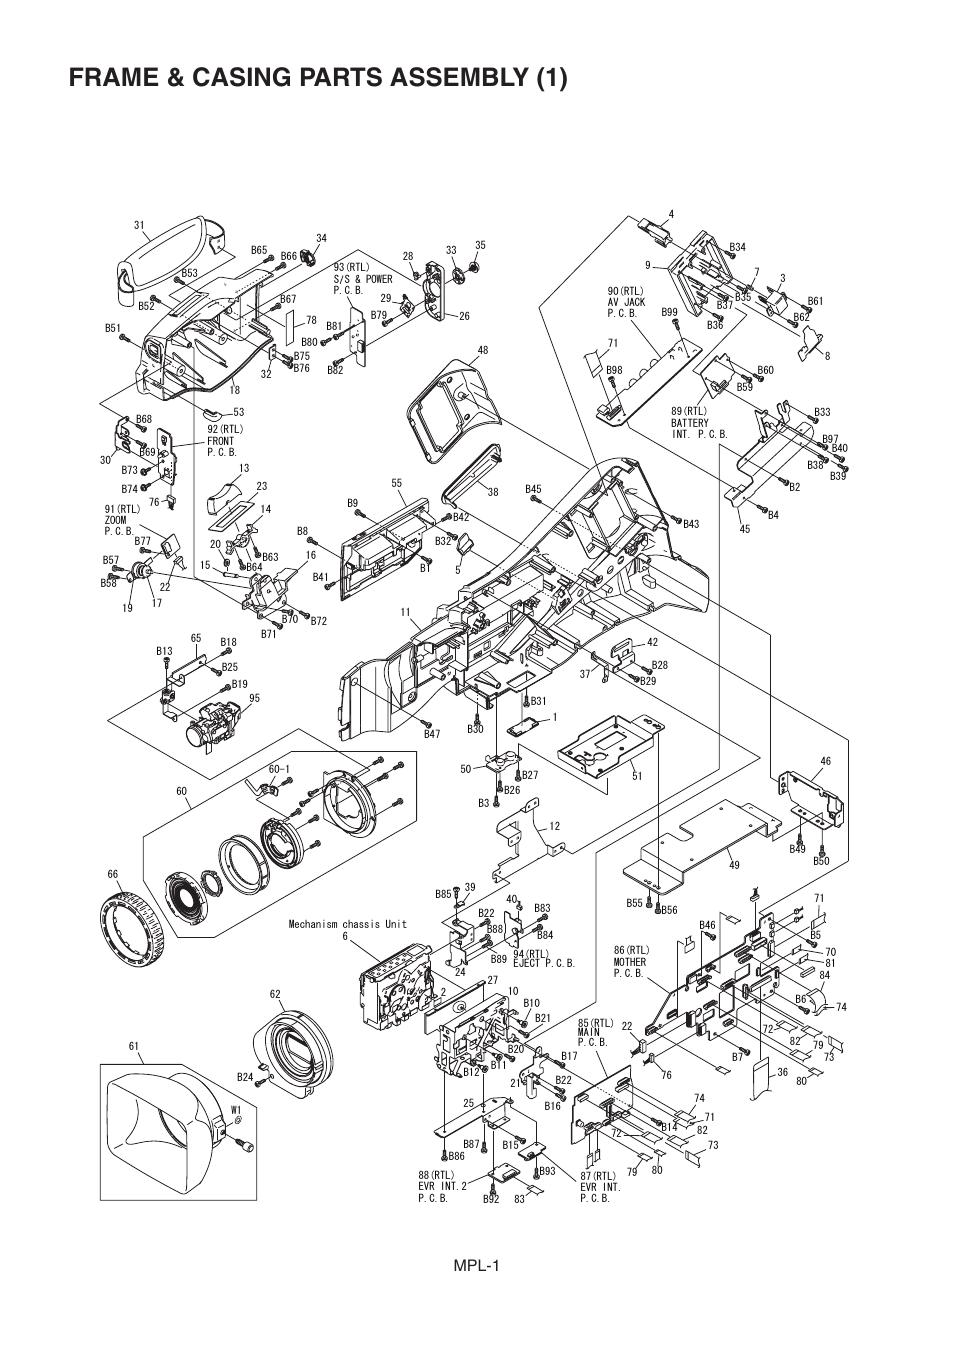 Frame &casing parts assembly (1), Frame & casing parts